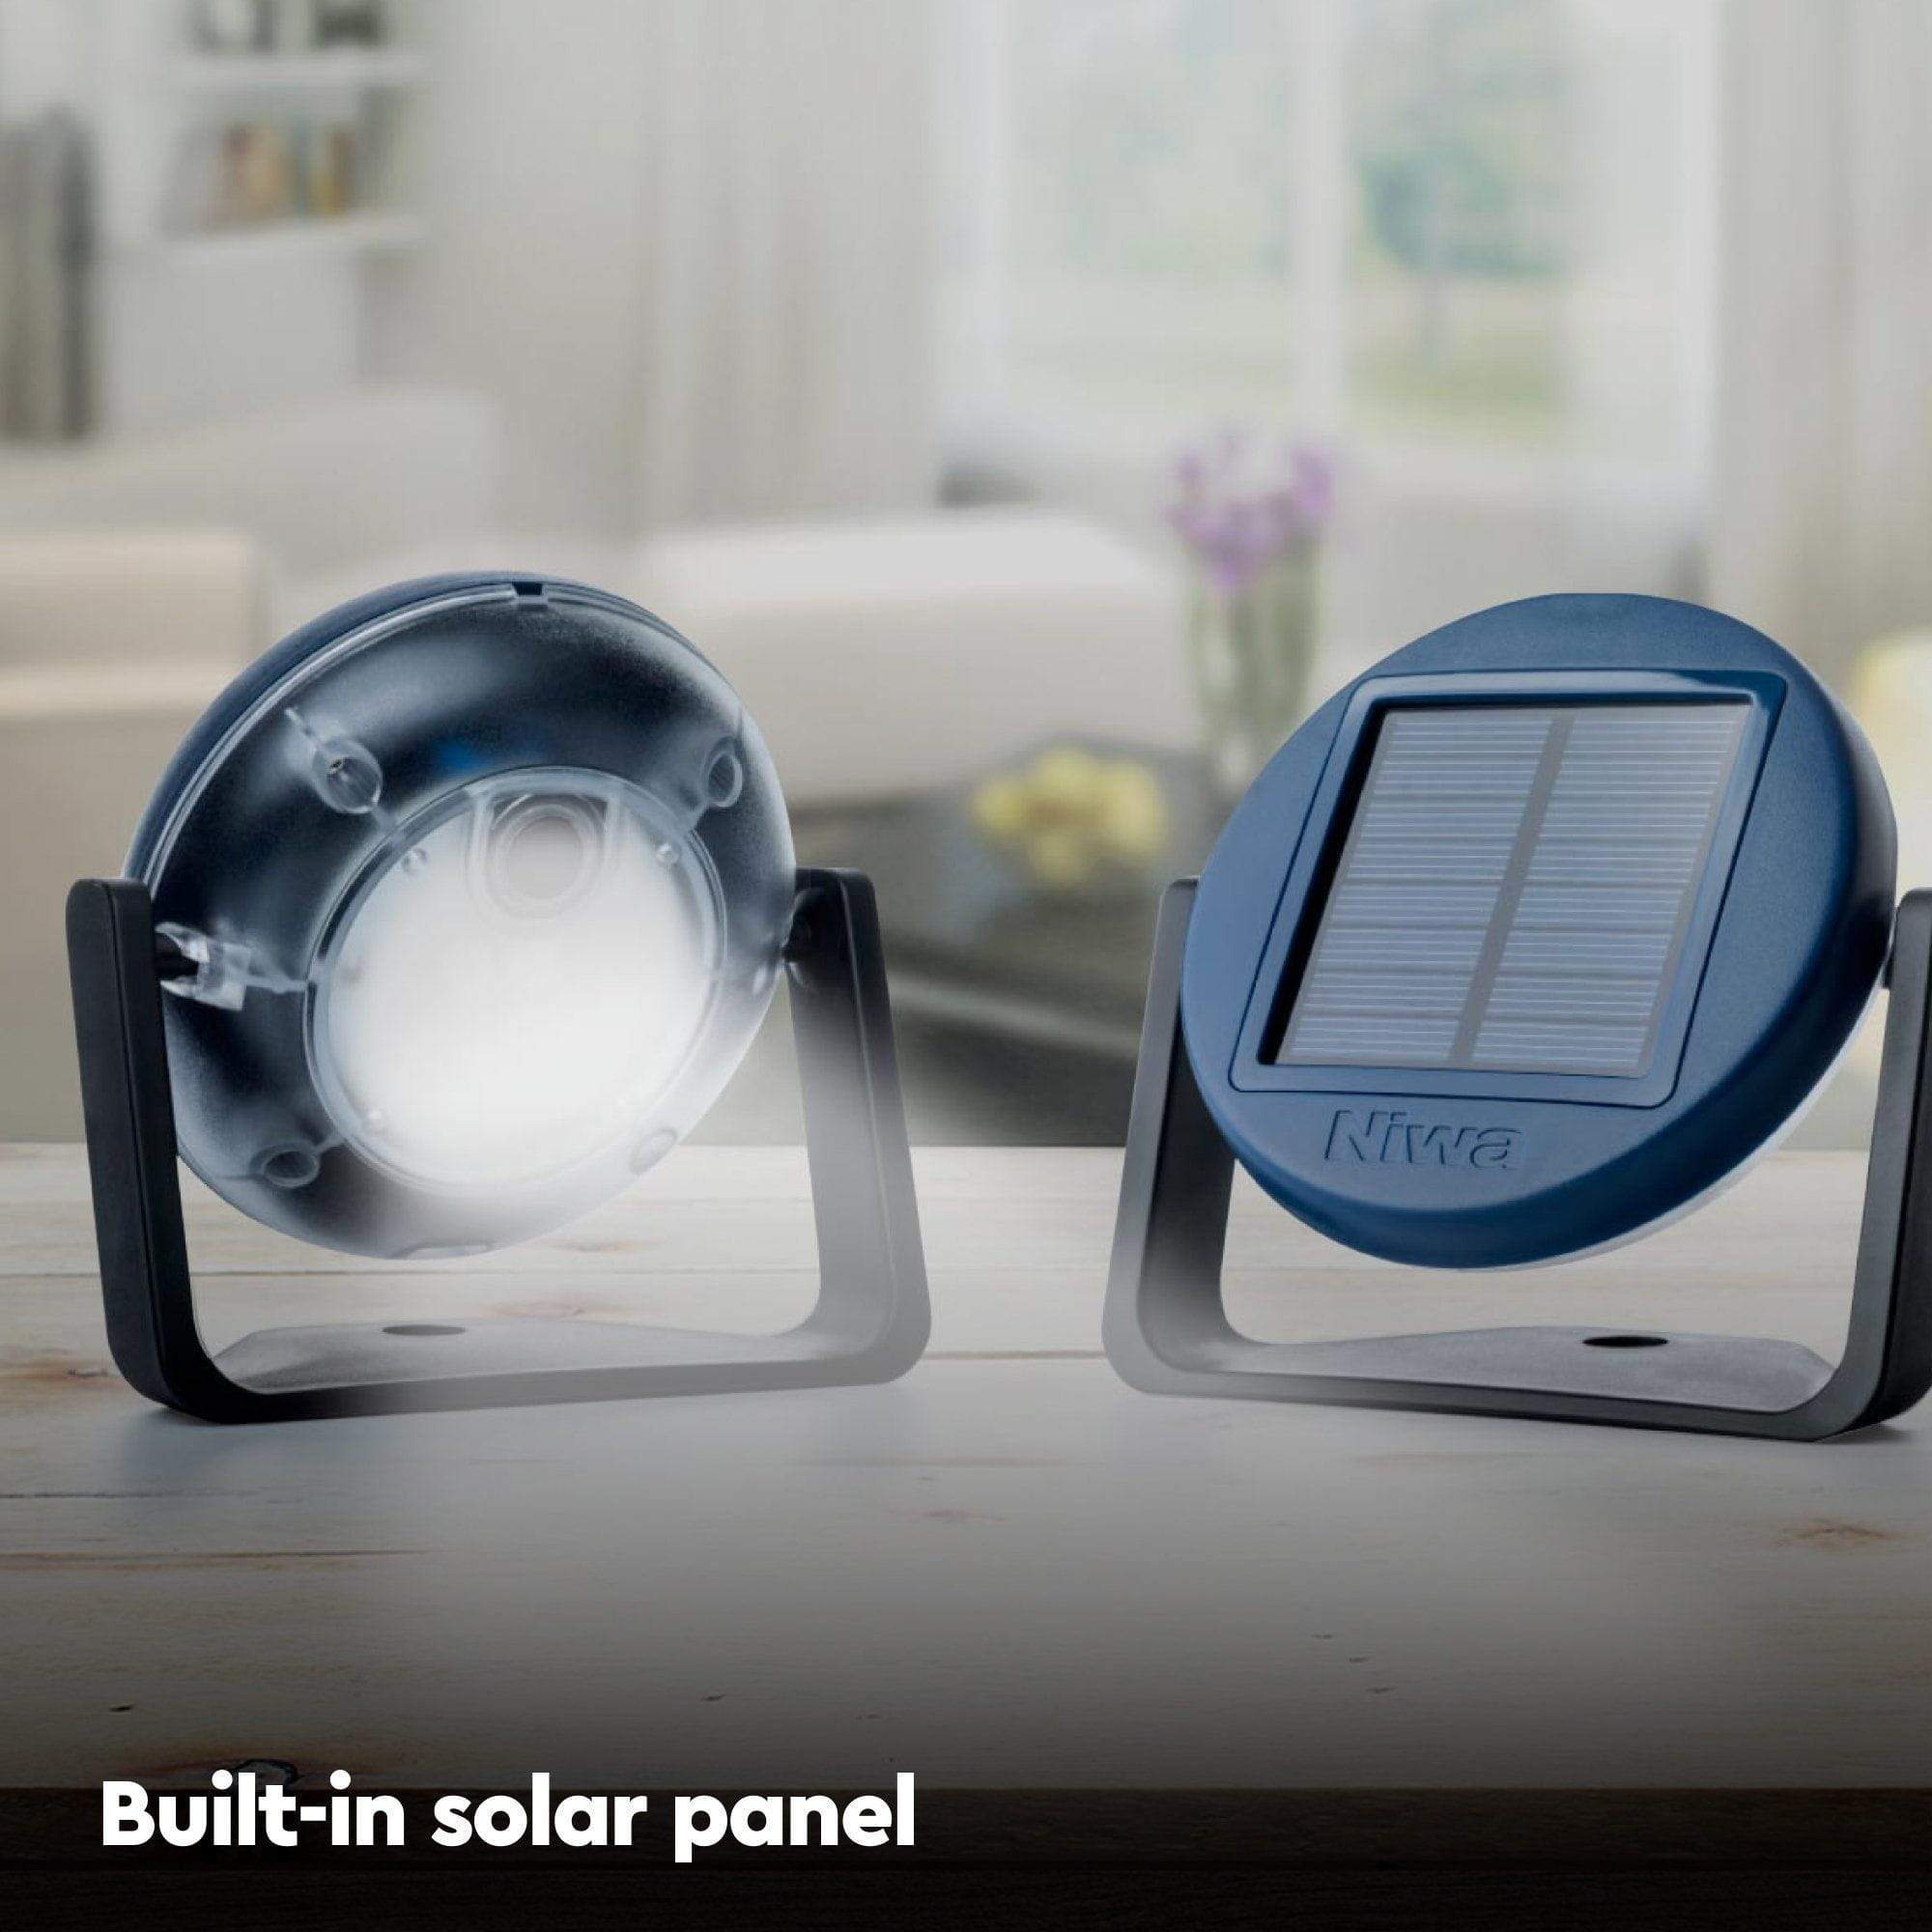 gosun-solarlamp-50-solar-camping-light-lifestyle-9_2000x